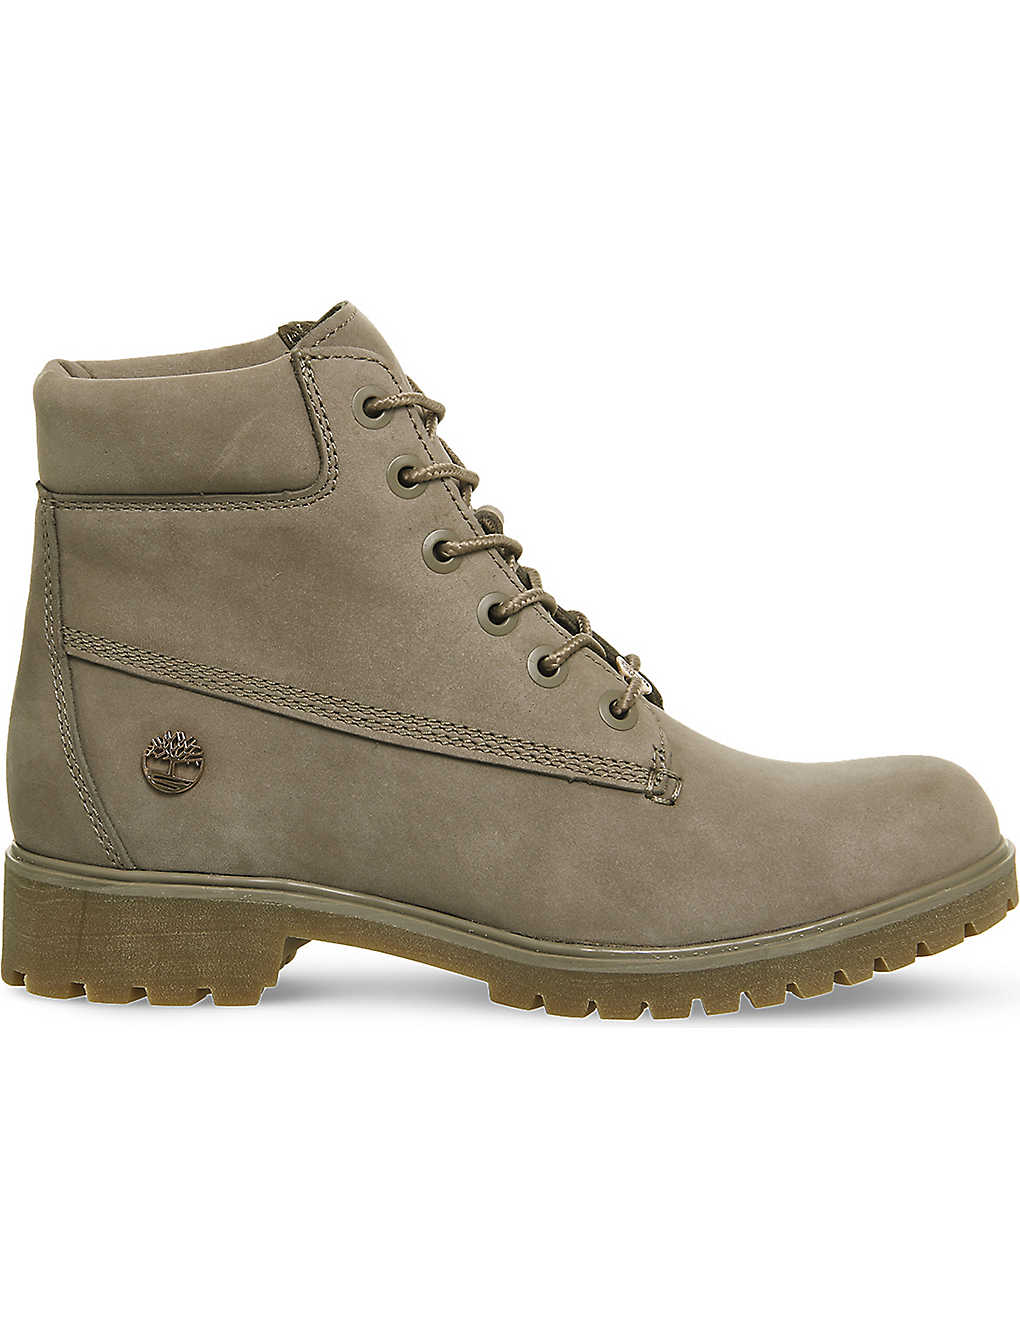 e35e30c8a4 Slim 6-inch leather boots - Pine bark nubuck ...